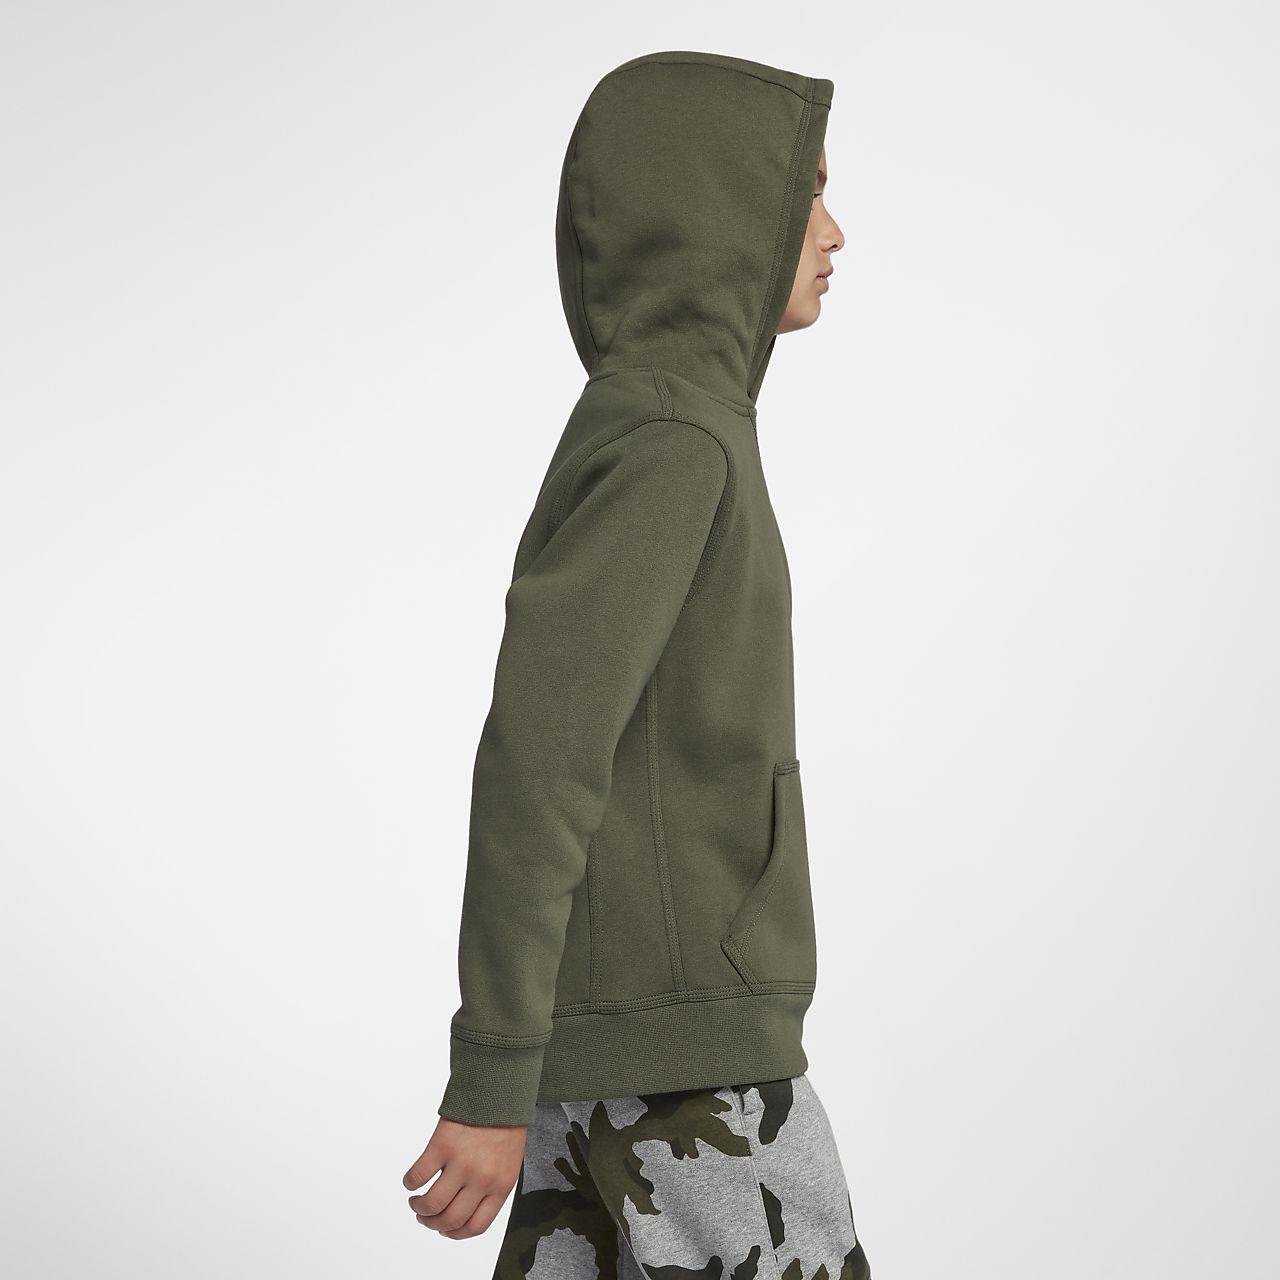 e647c4f7365 Παιδική μπλούζα προπόνησης με κουκούλα Nike. Nike.com GR